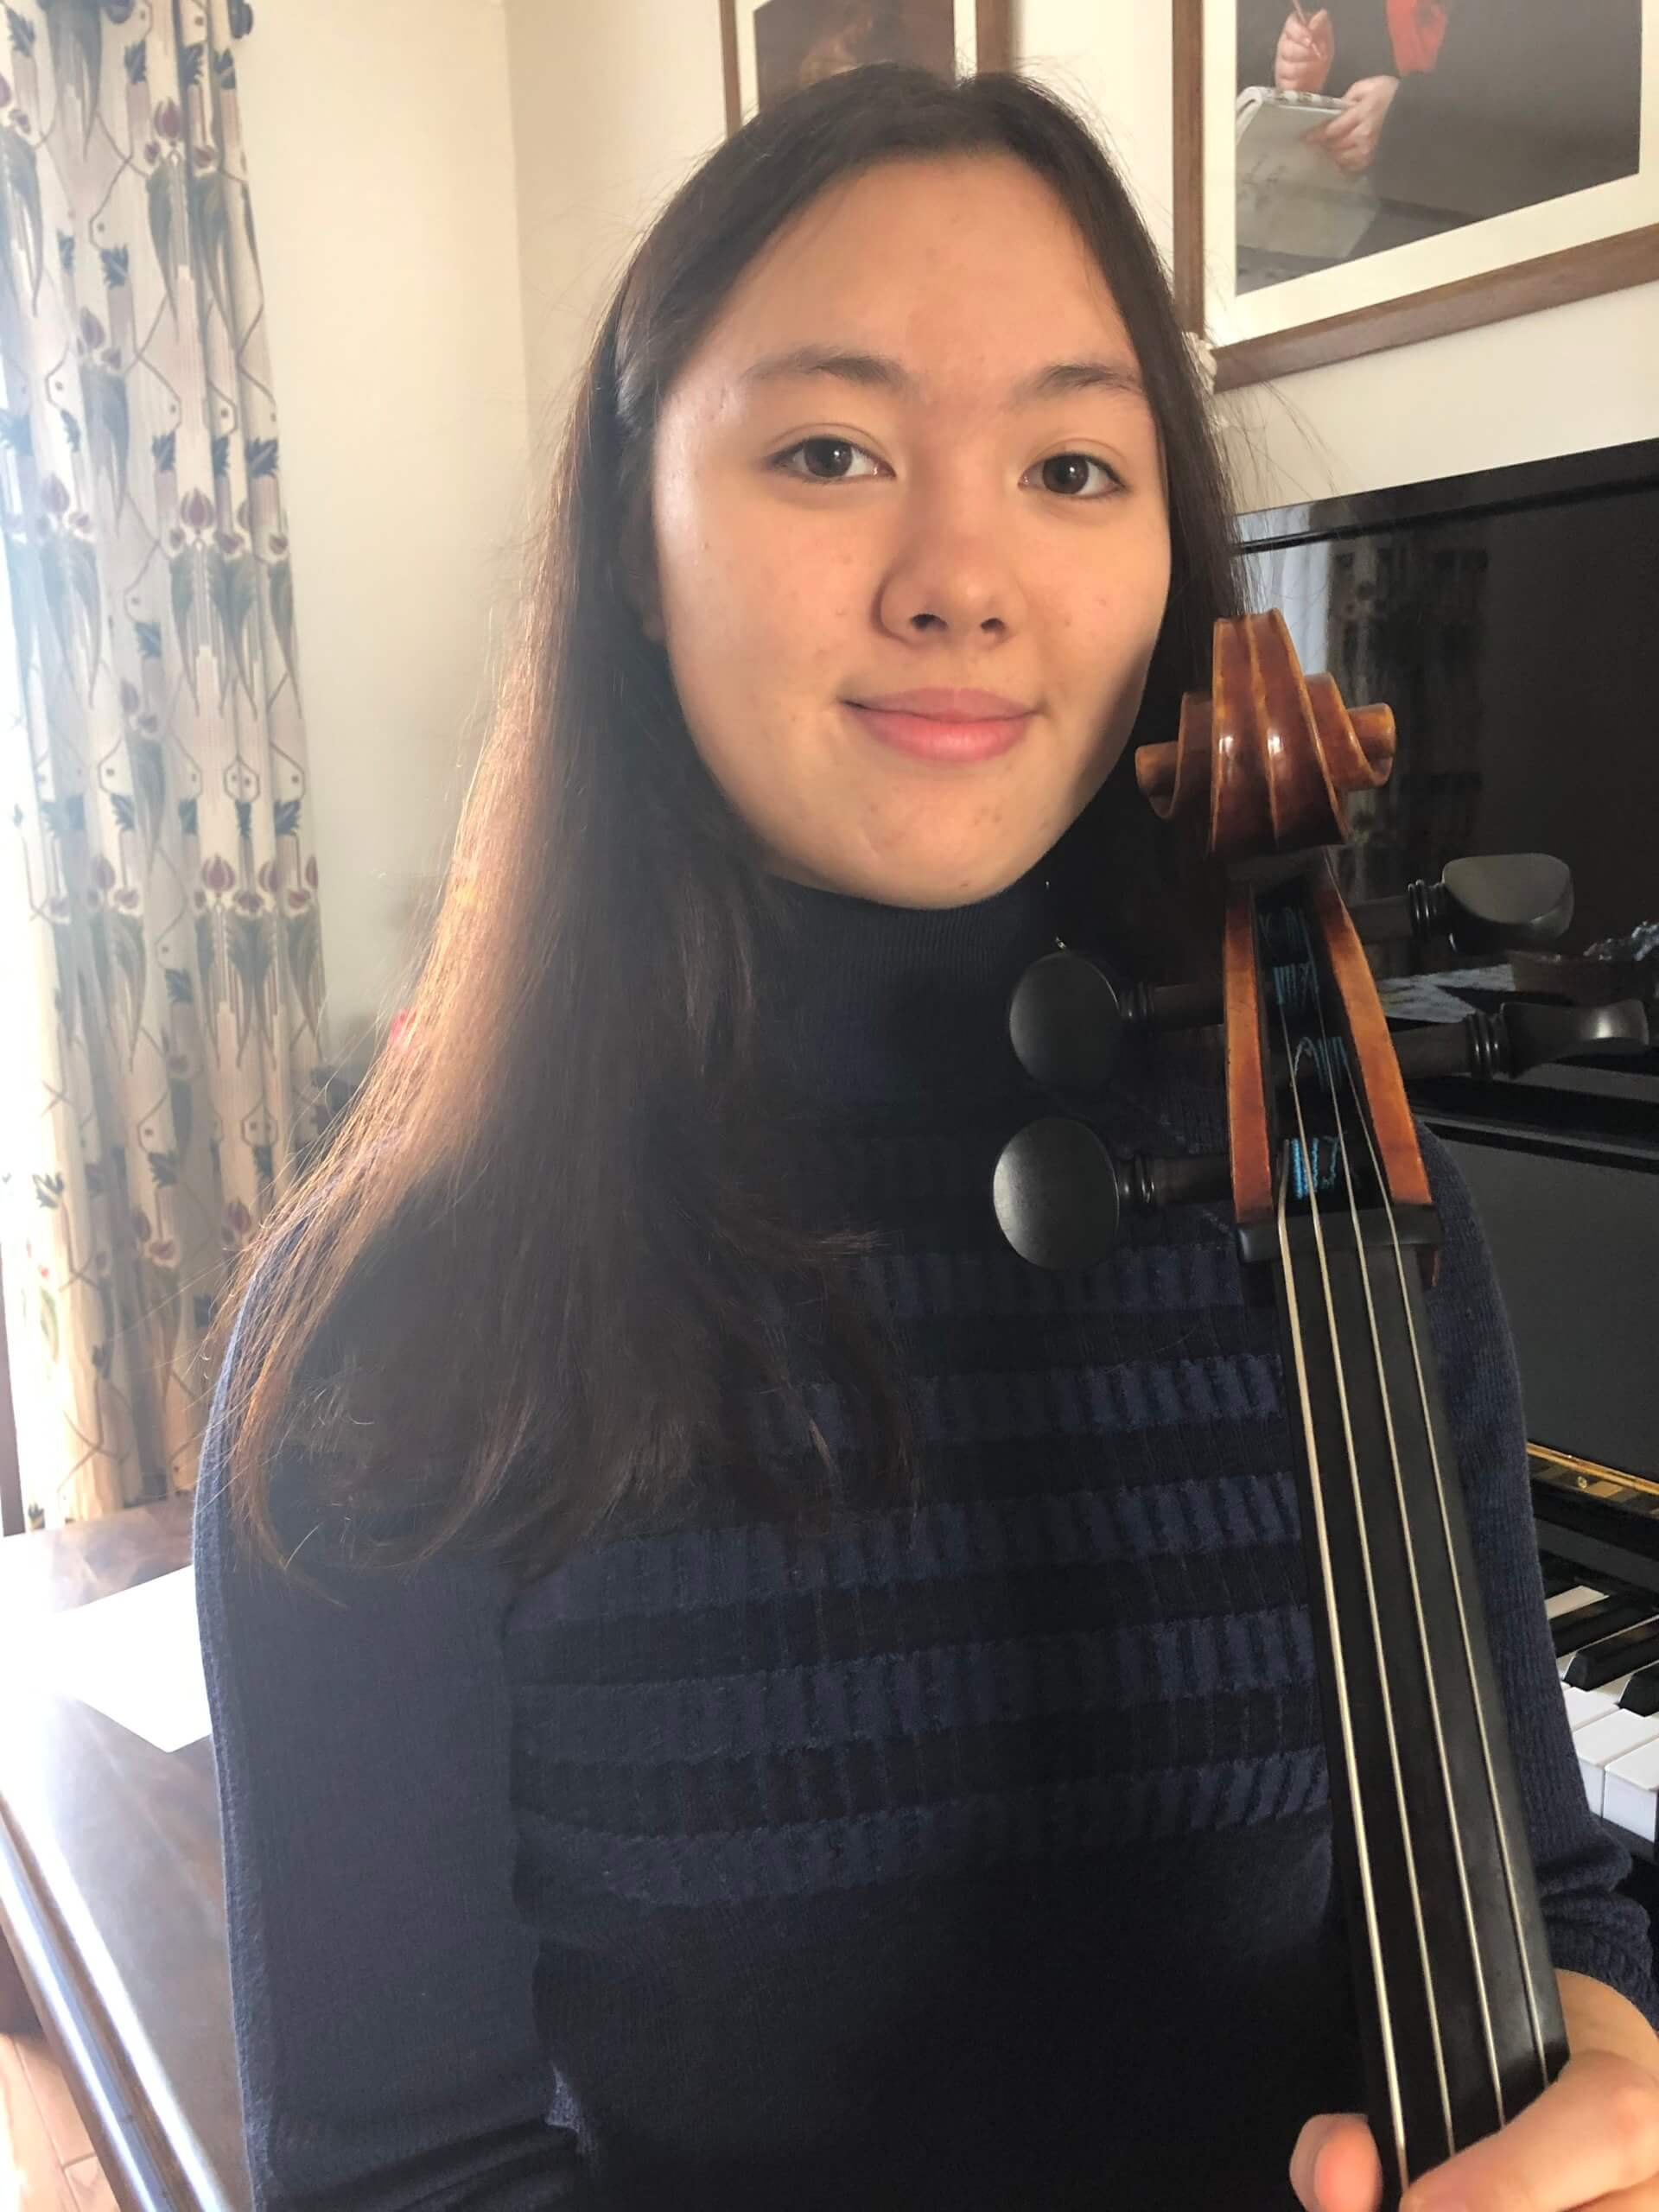 Junior Conservatoire of Music student Emily Brockett